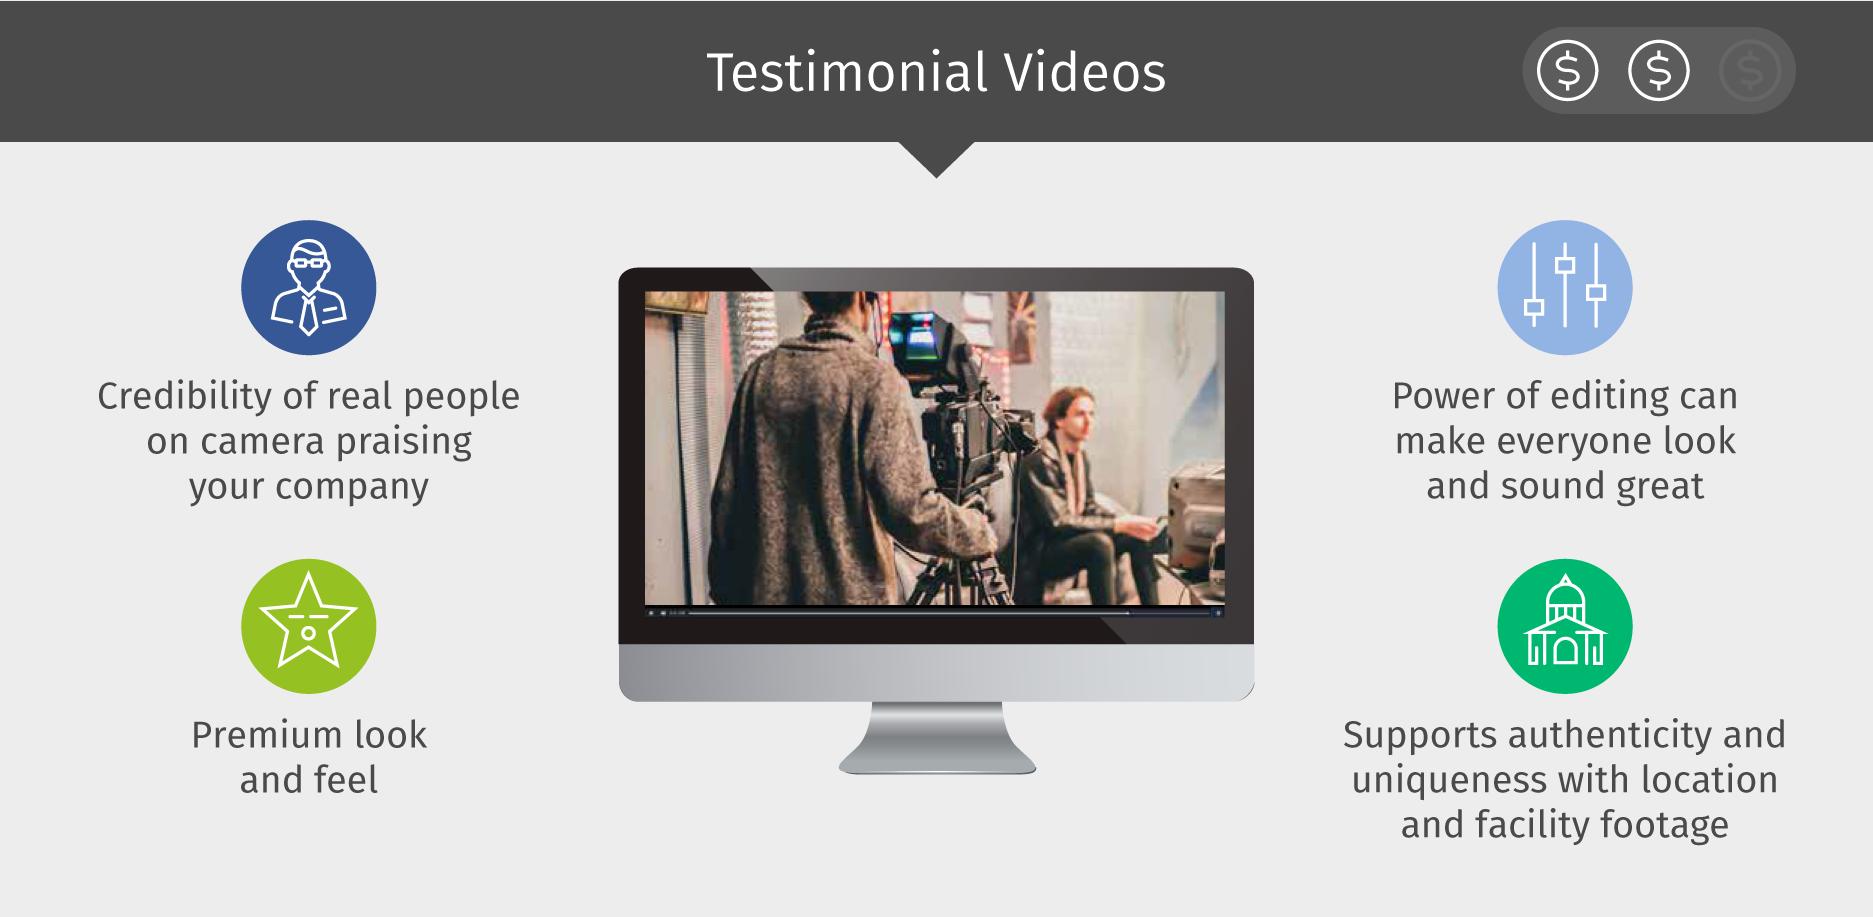 Testimonial Videos